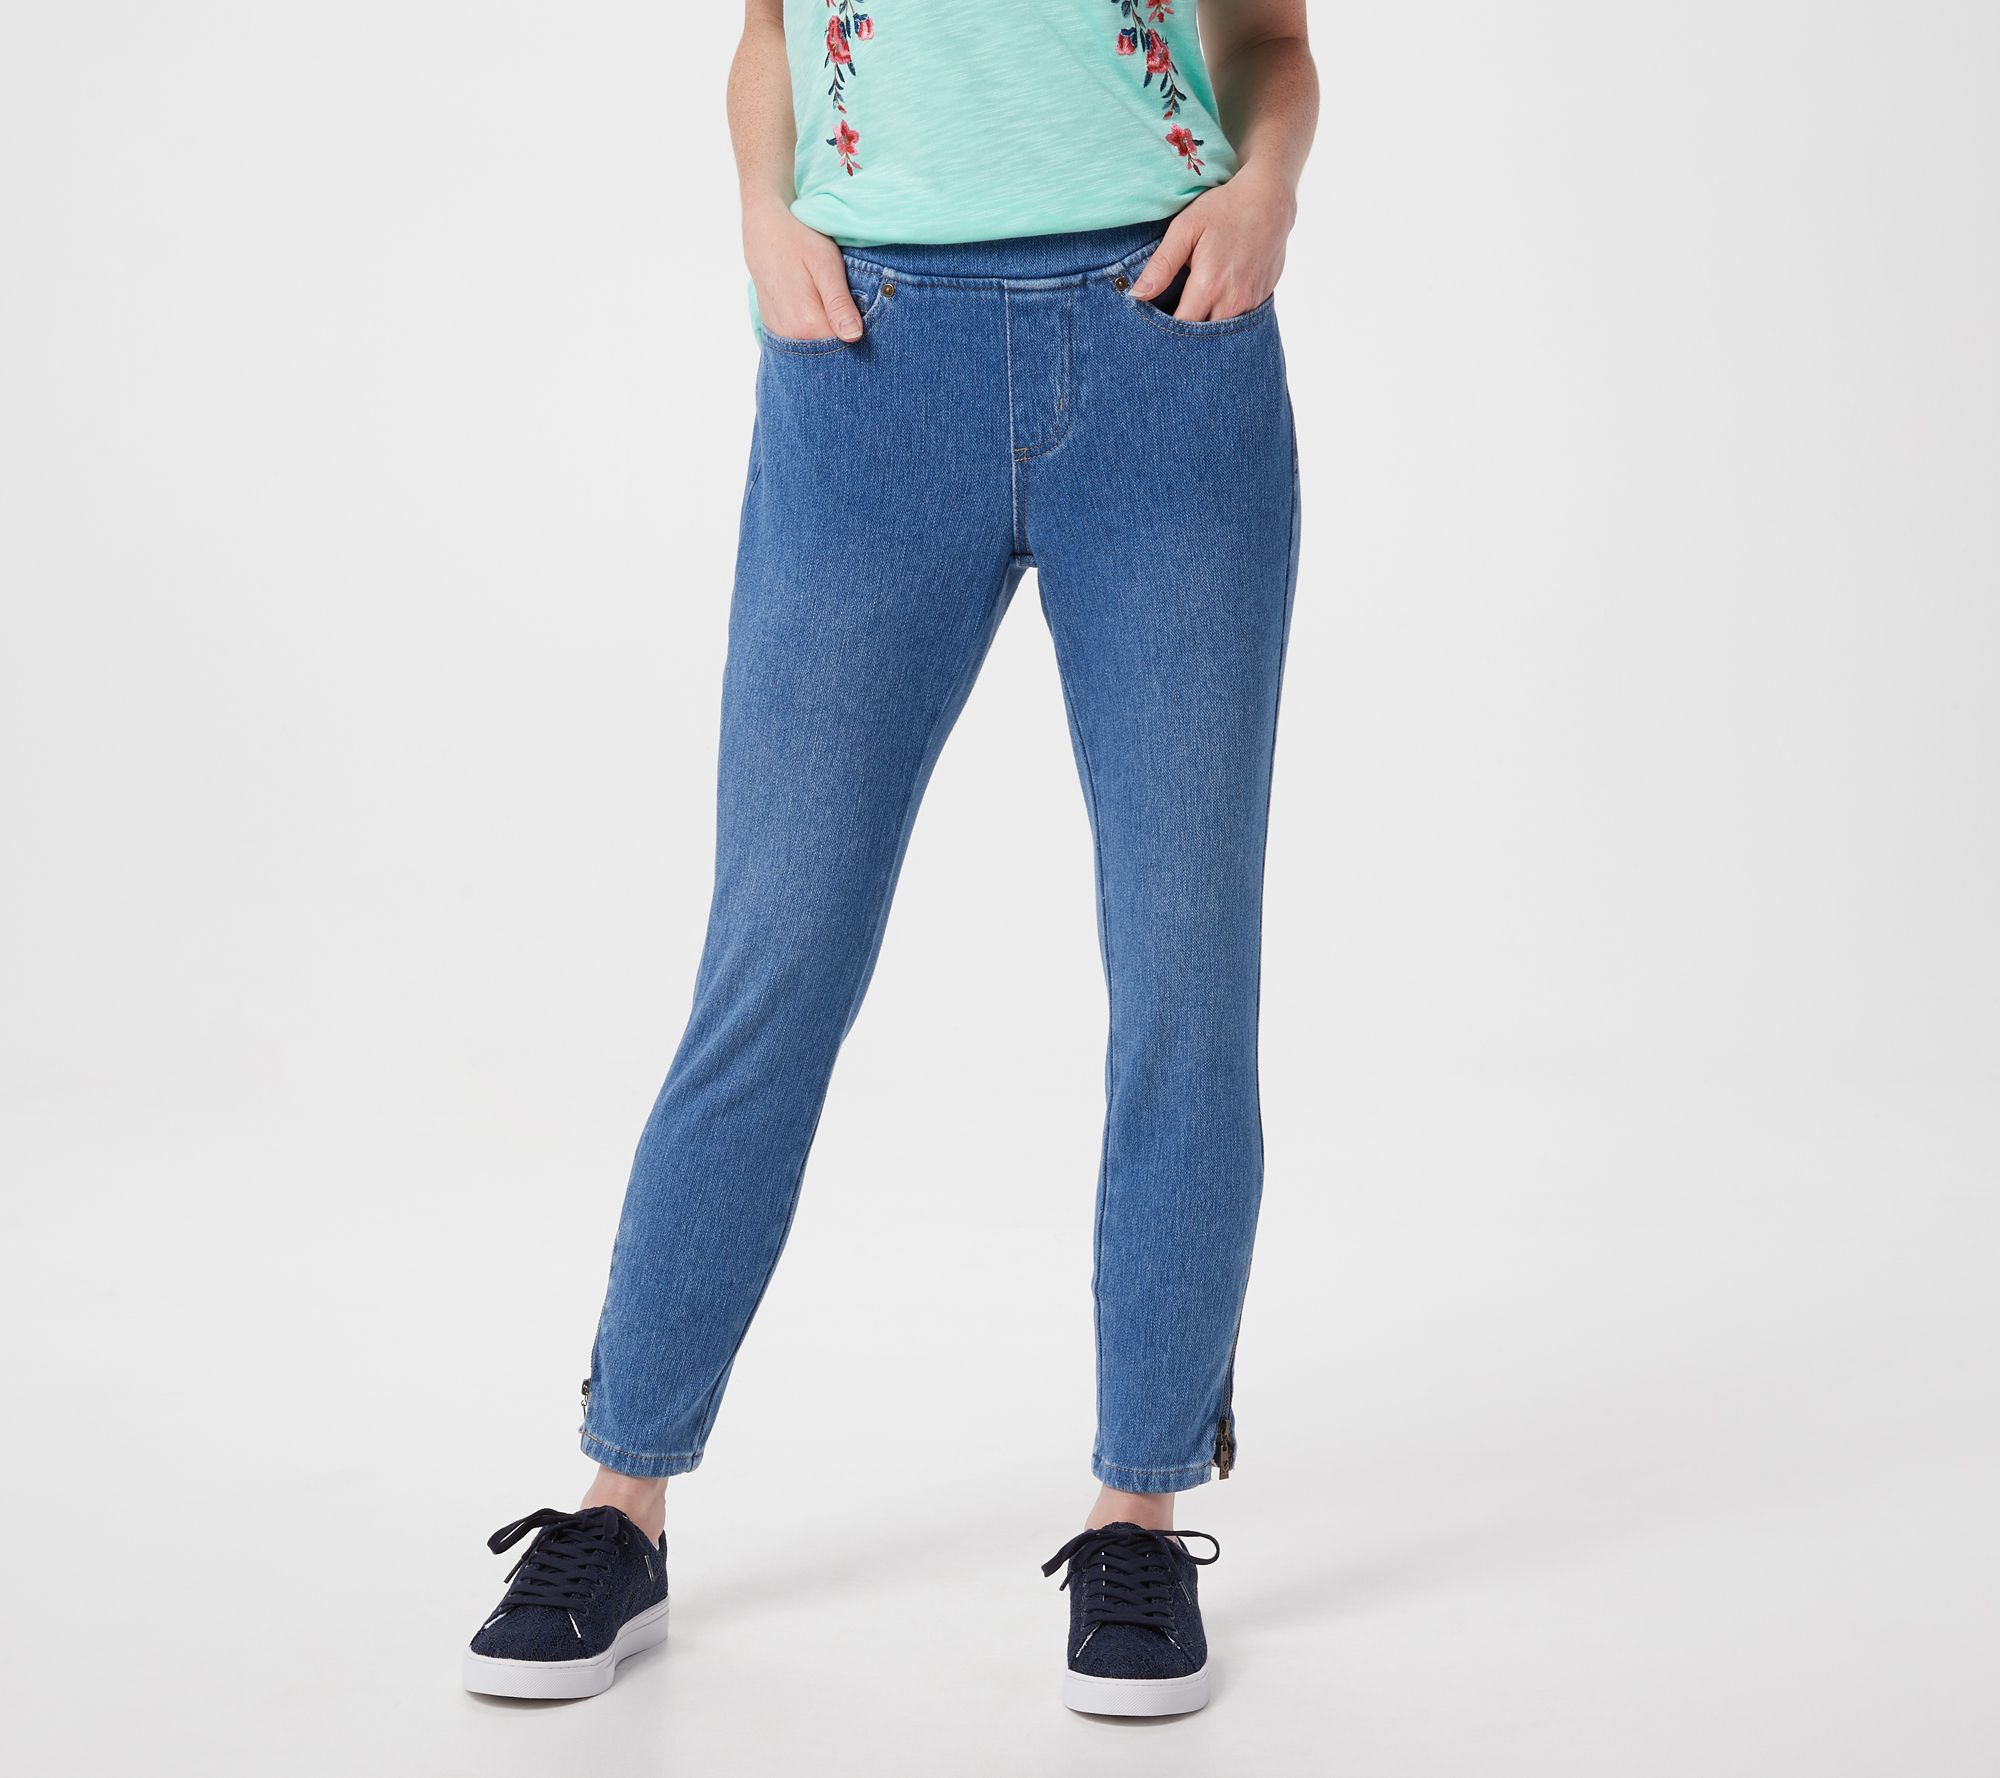 "New Simply B Plus taille Slim Leg Jeans Bleu Noir Taille 26 Jambe 31/"" RRP £ 40"